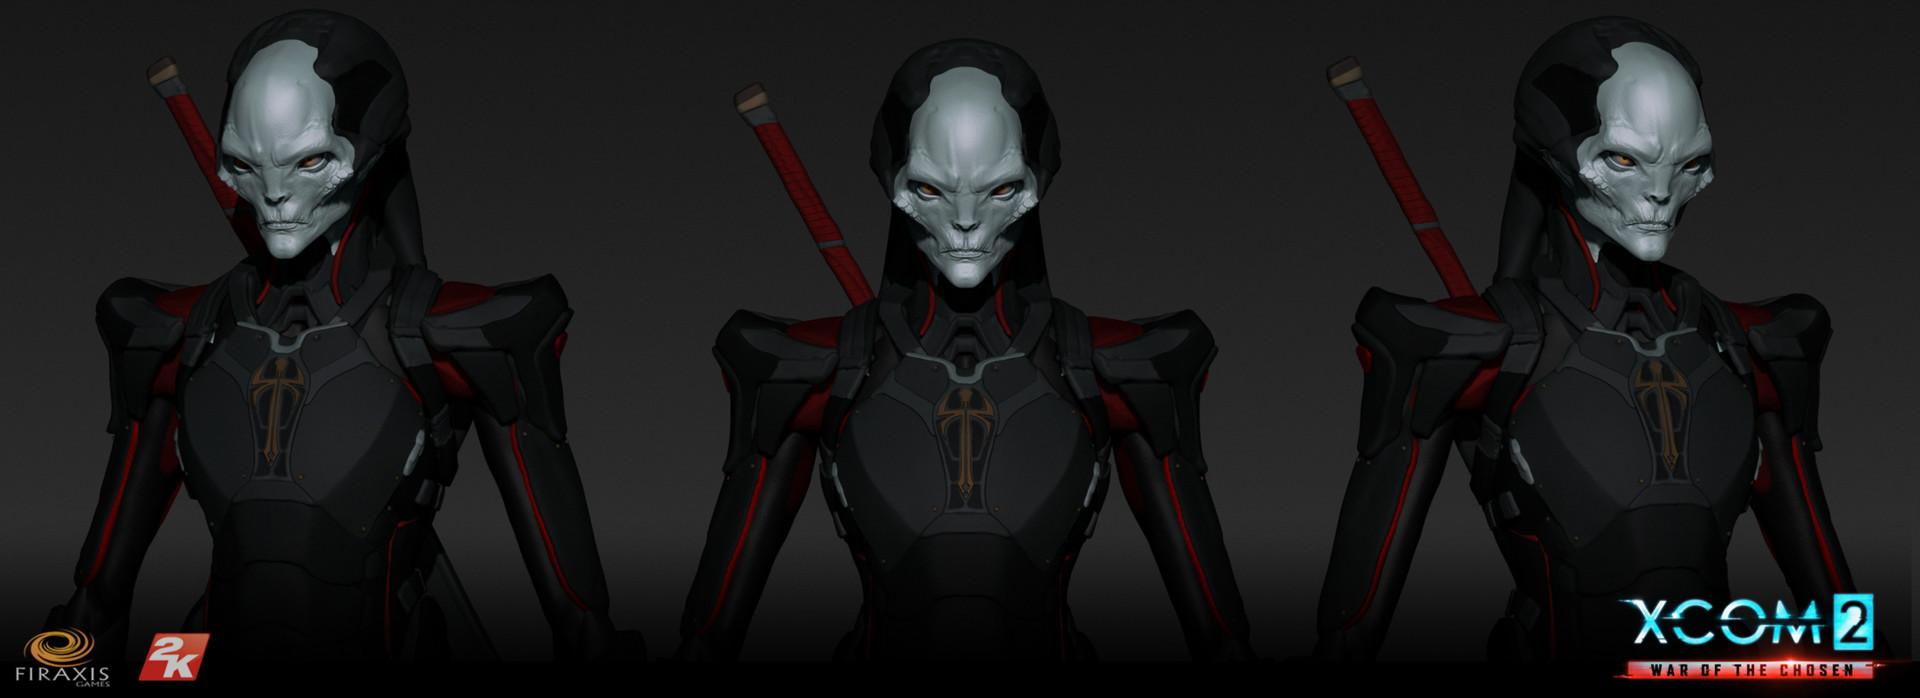 Matthew kean chosen assassin eexpressions stern